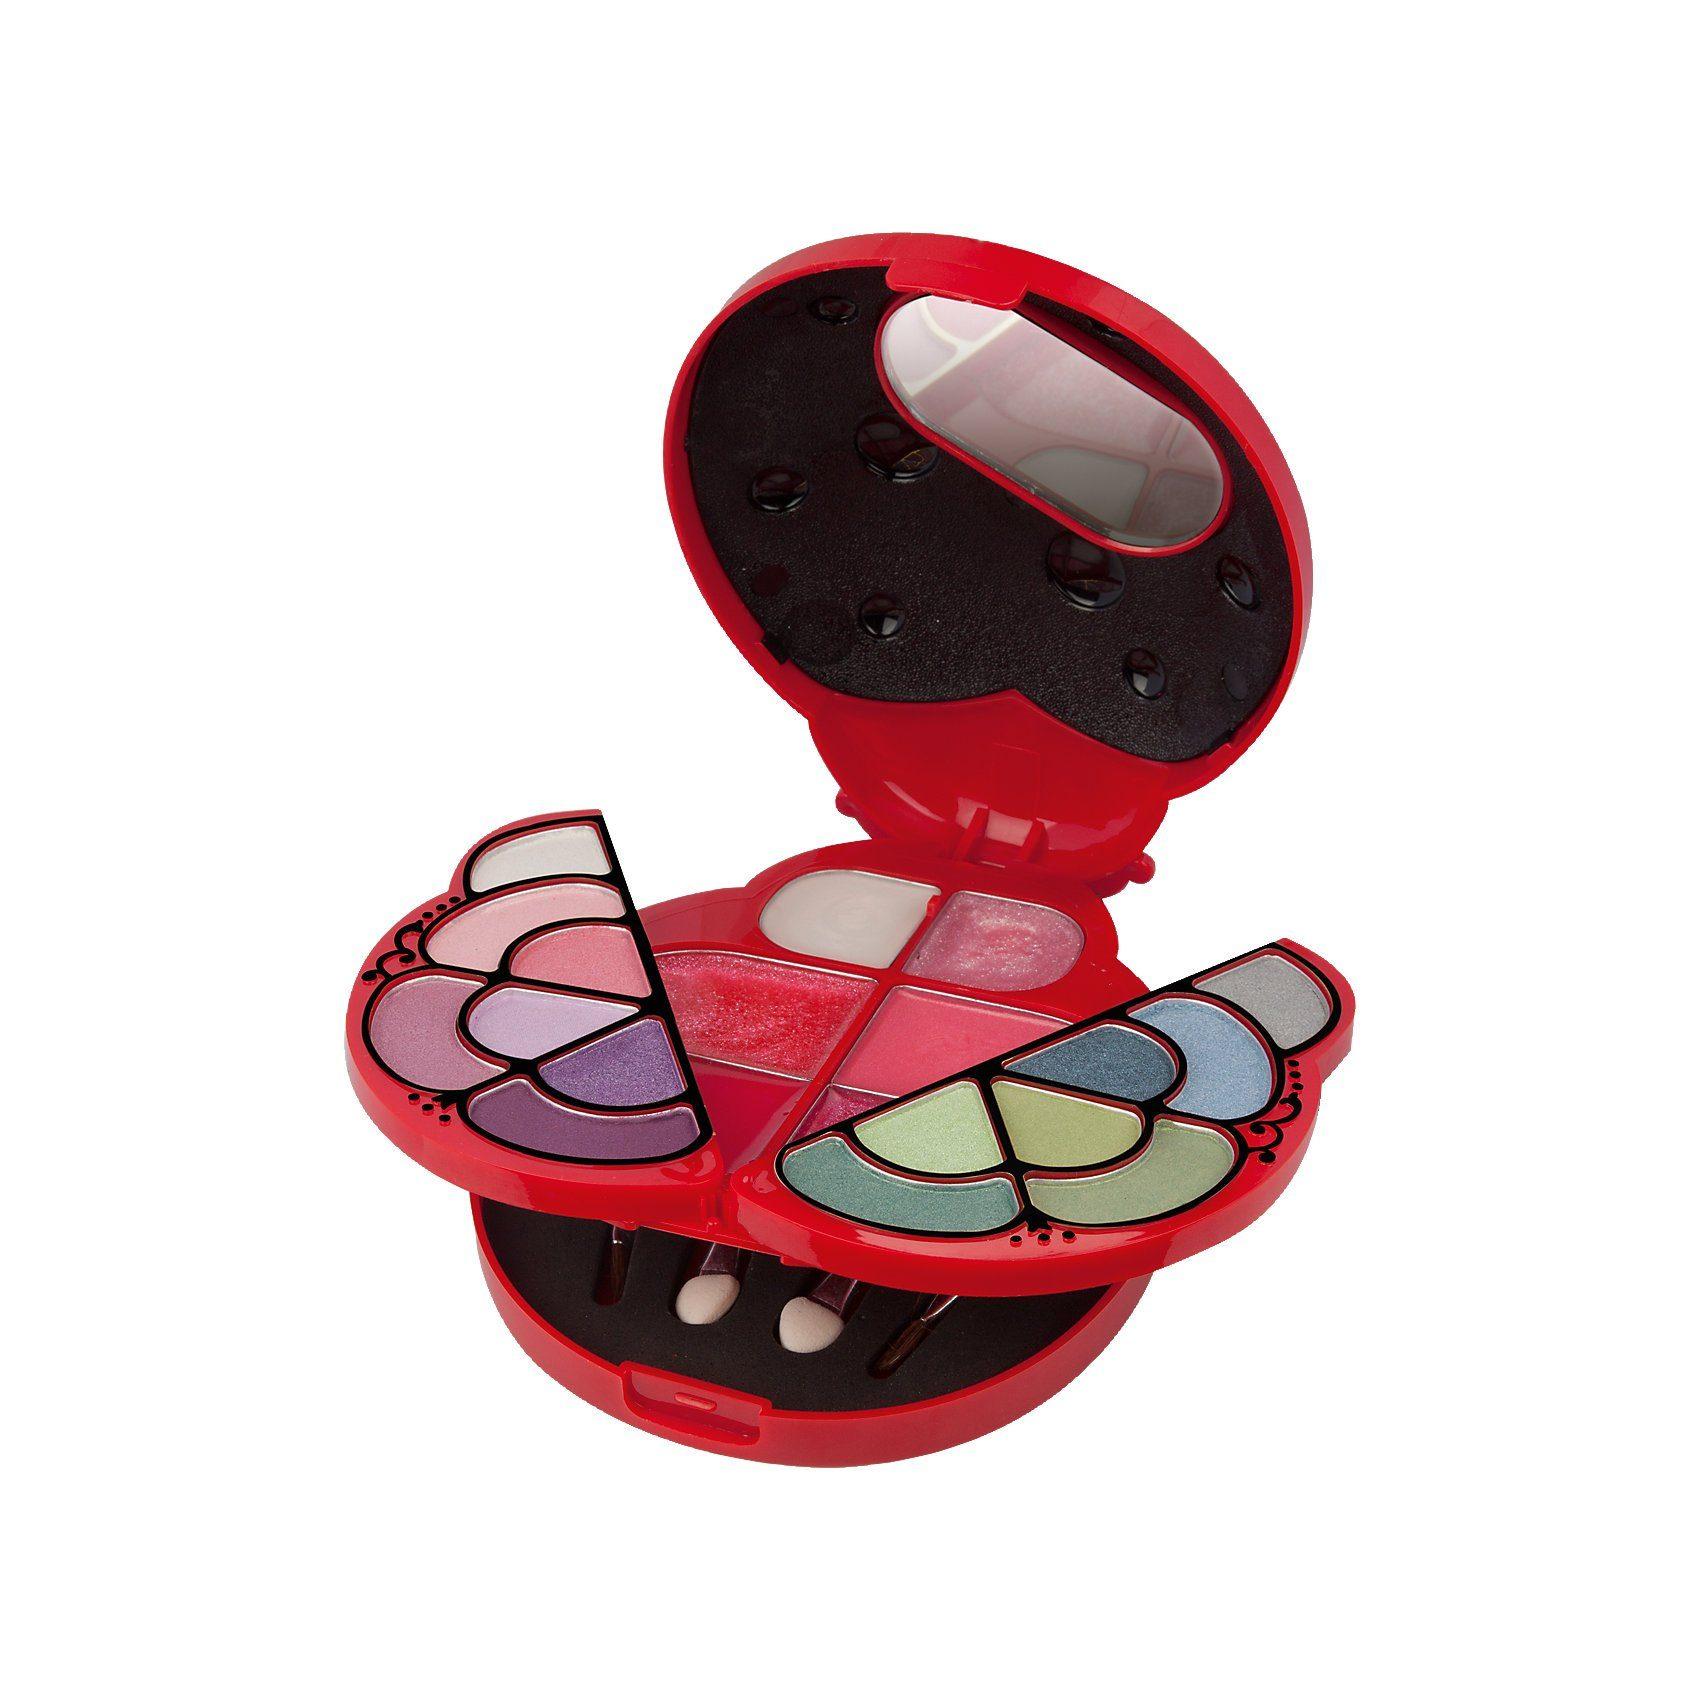 Ladybug's Makeup Treasure